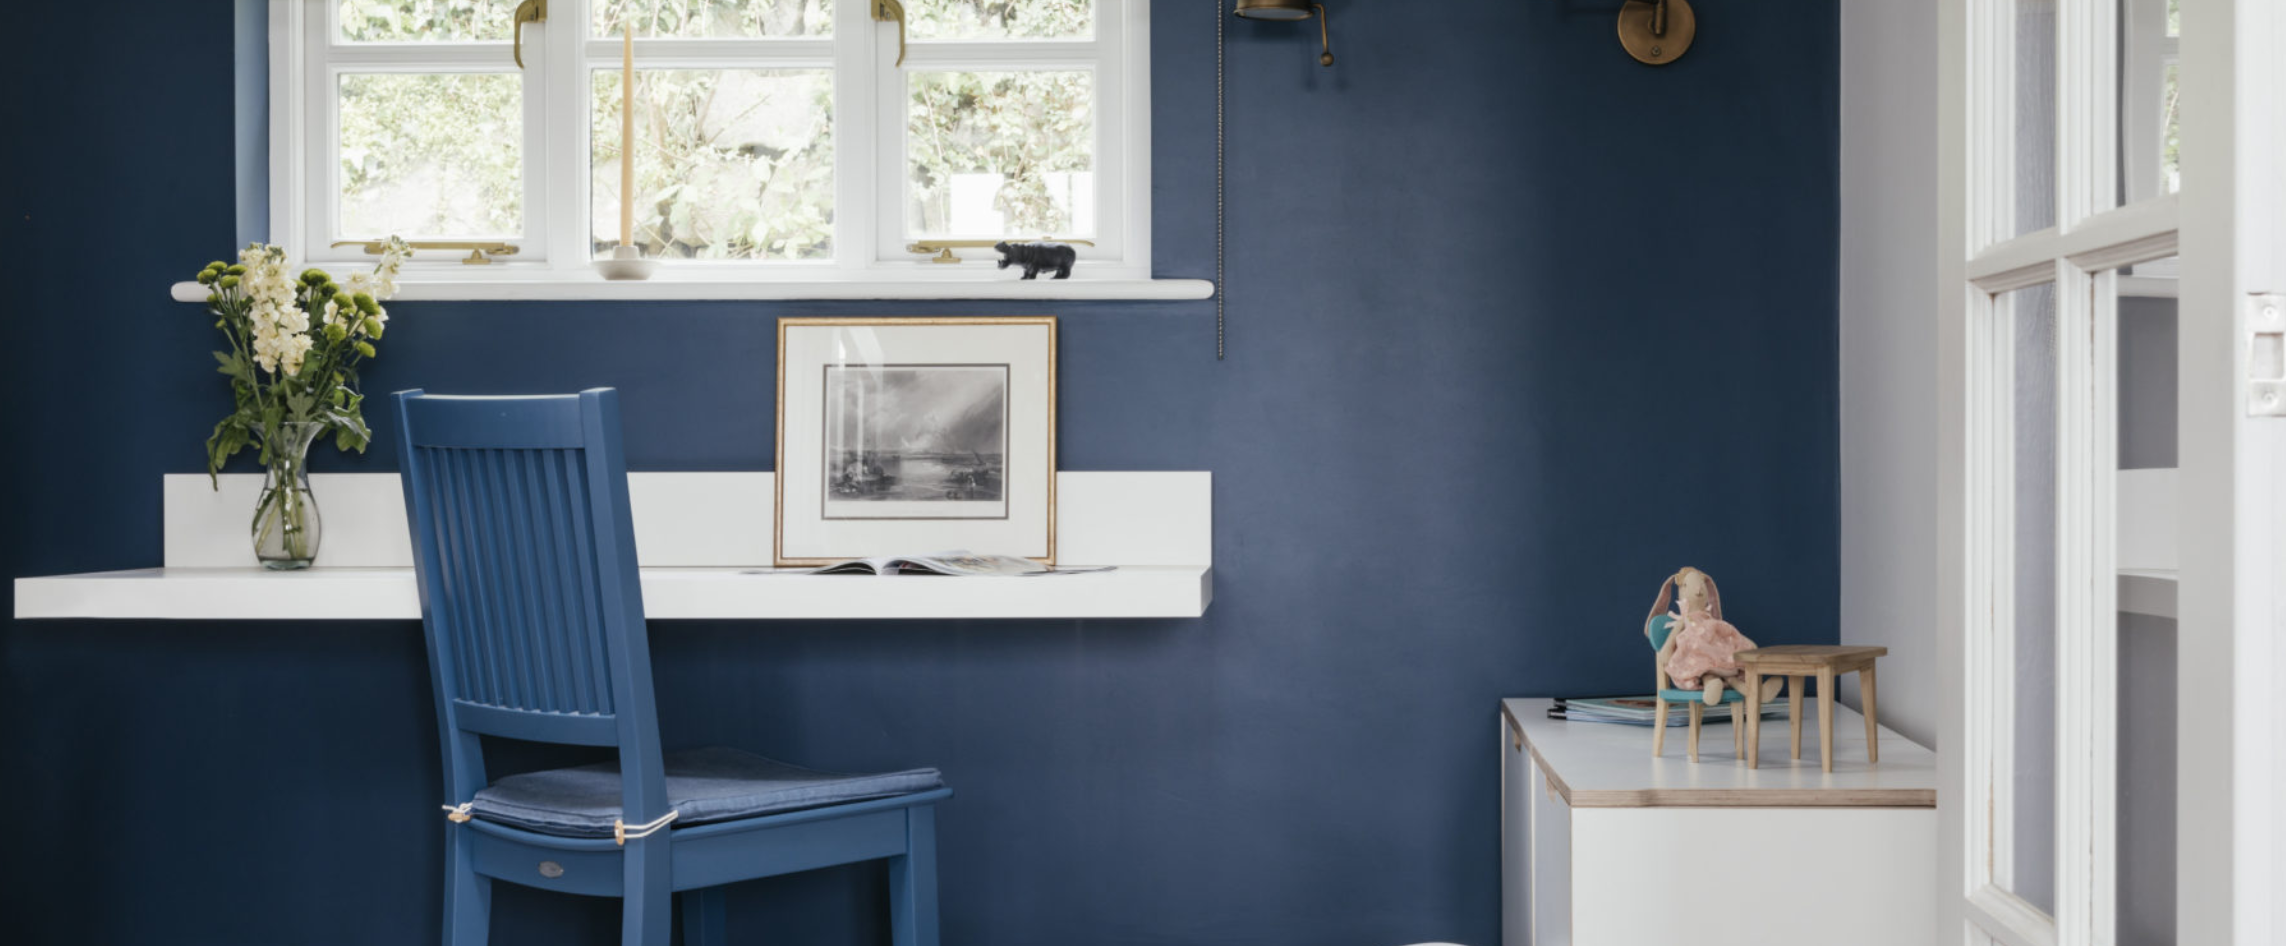 Interior Design Q A With Tanya Leech Humphrey Munson Kitchens